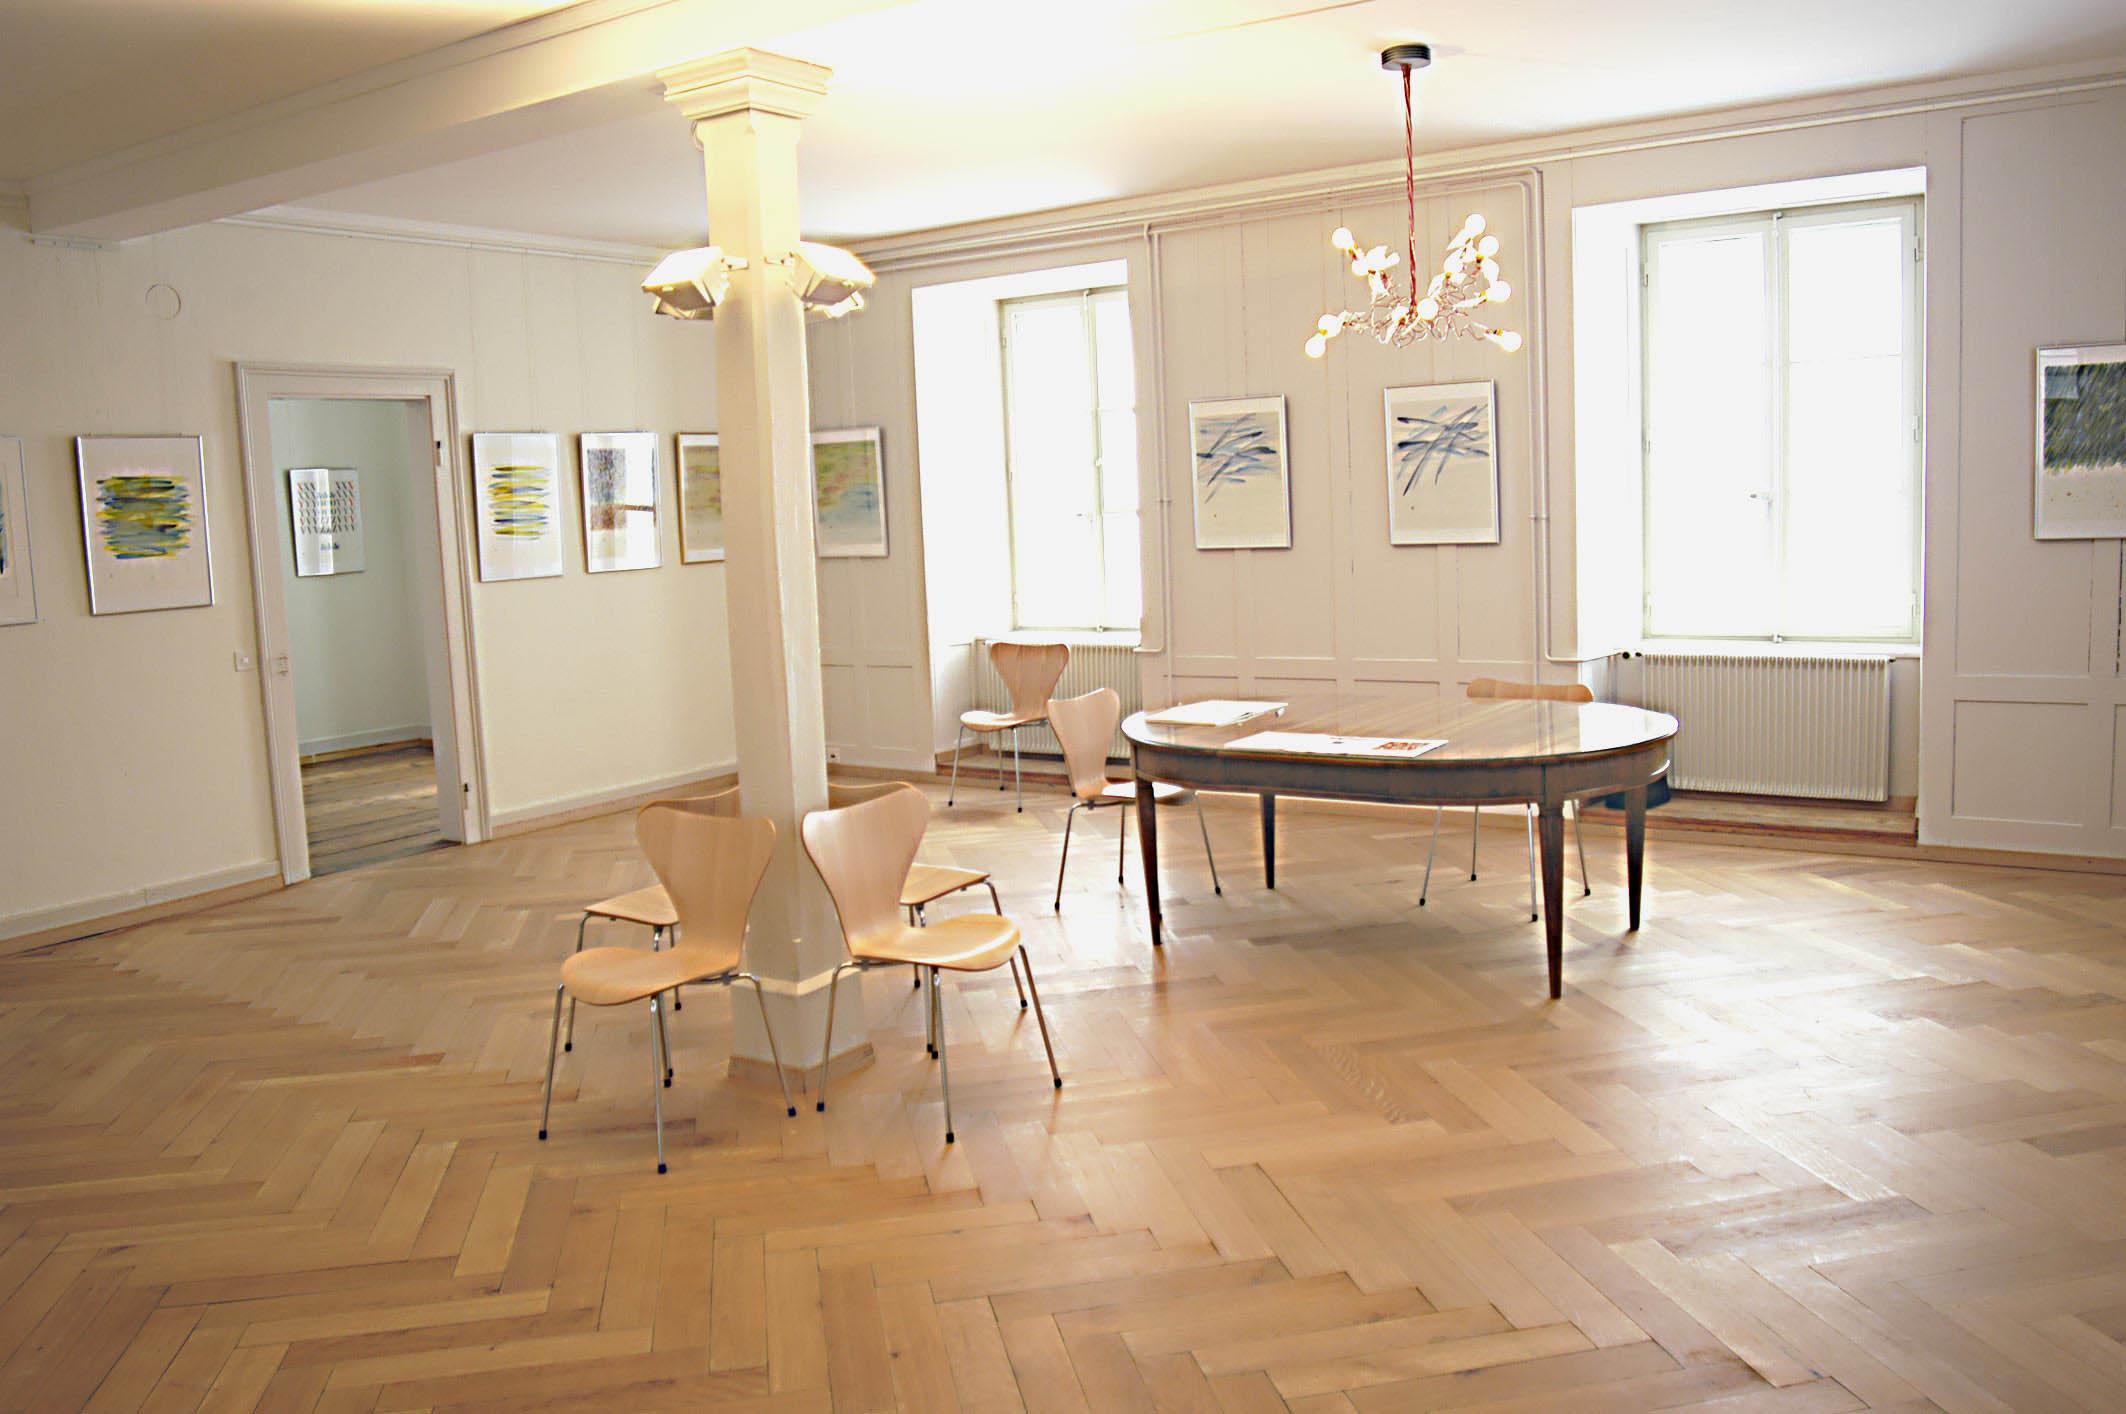 kulturhof schloss k niz chornhuus galerie. Black Bedroom Furniture Sets. Home Design Ideas